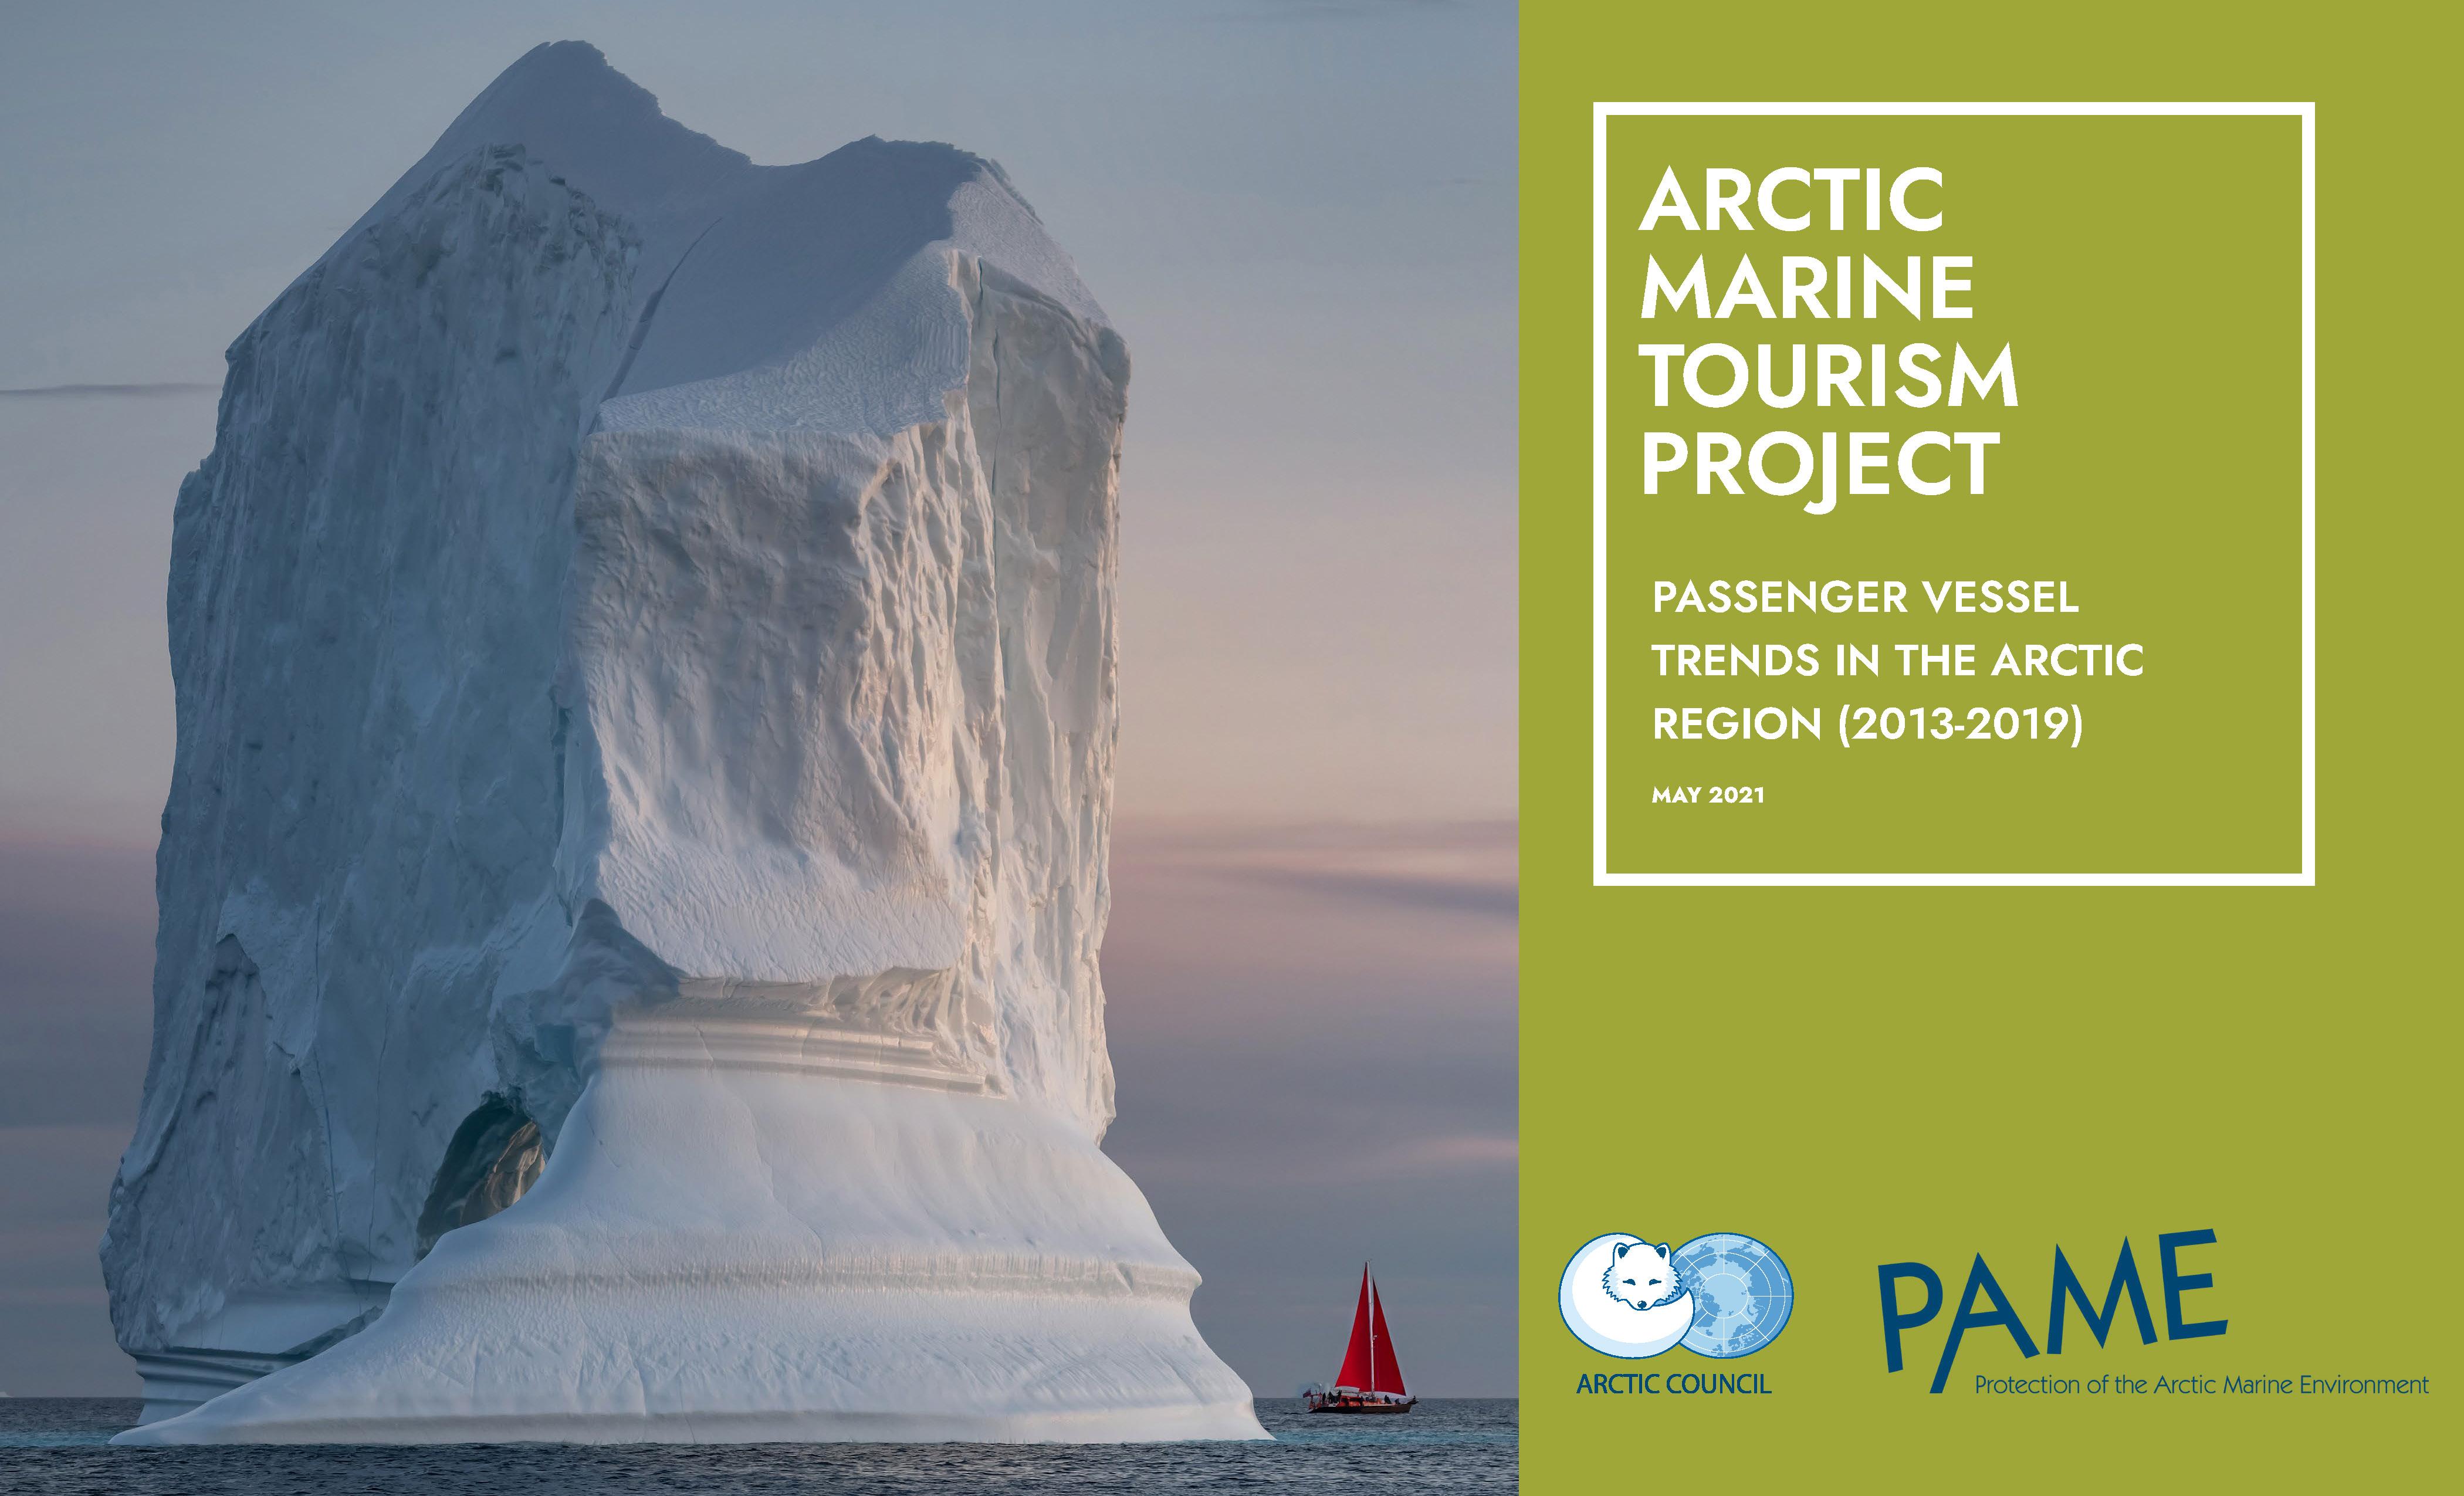 Arctic Marine Tourism Project: Passenger Vessel Trends in the Arctic Region  (2013-2019)